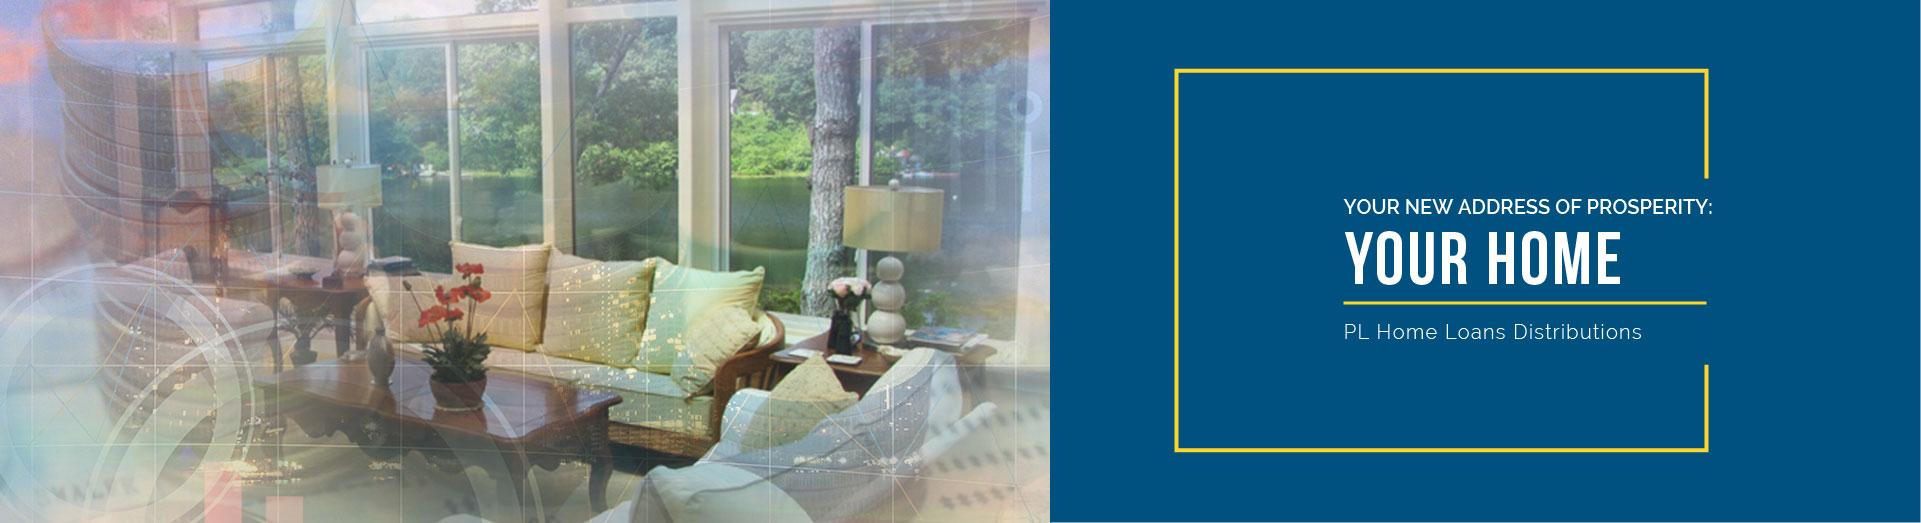 Hdfc Home Loan Services Home Loan India Prabhudas Lilladher